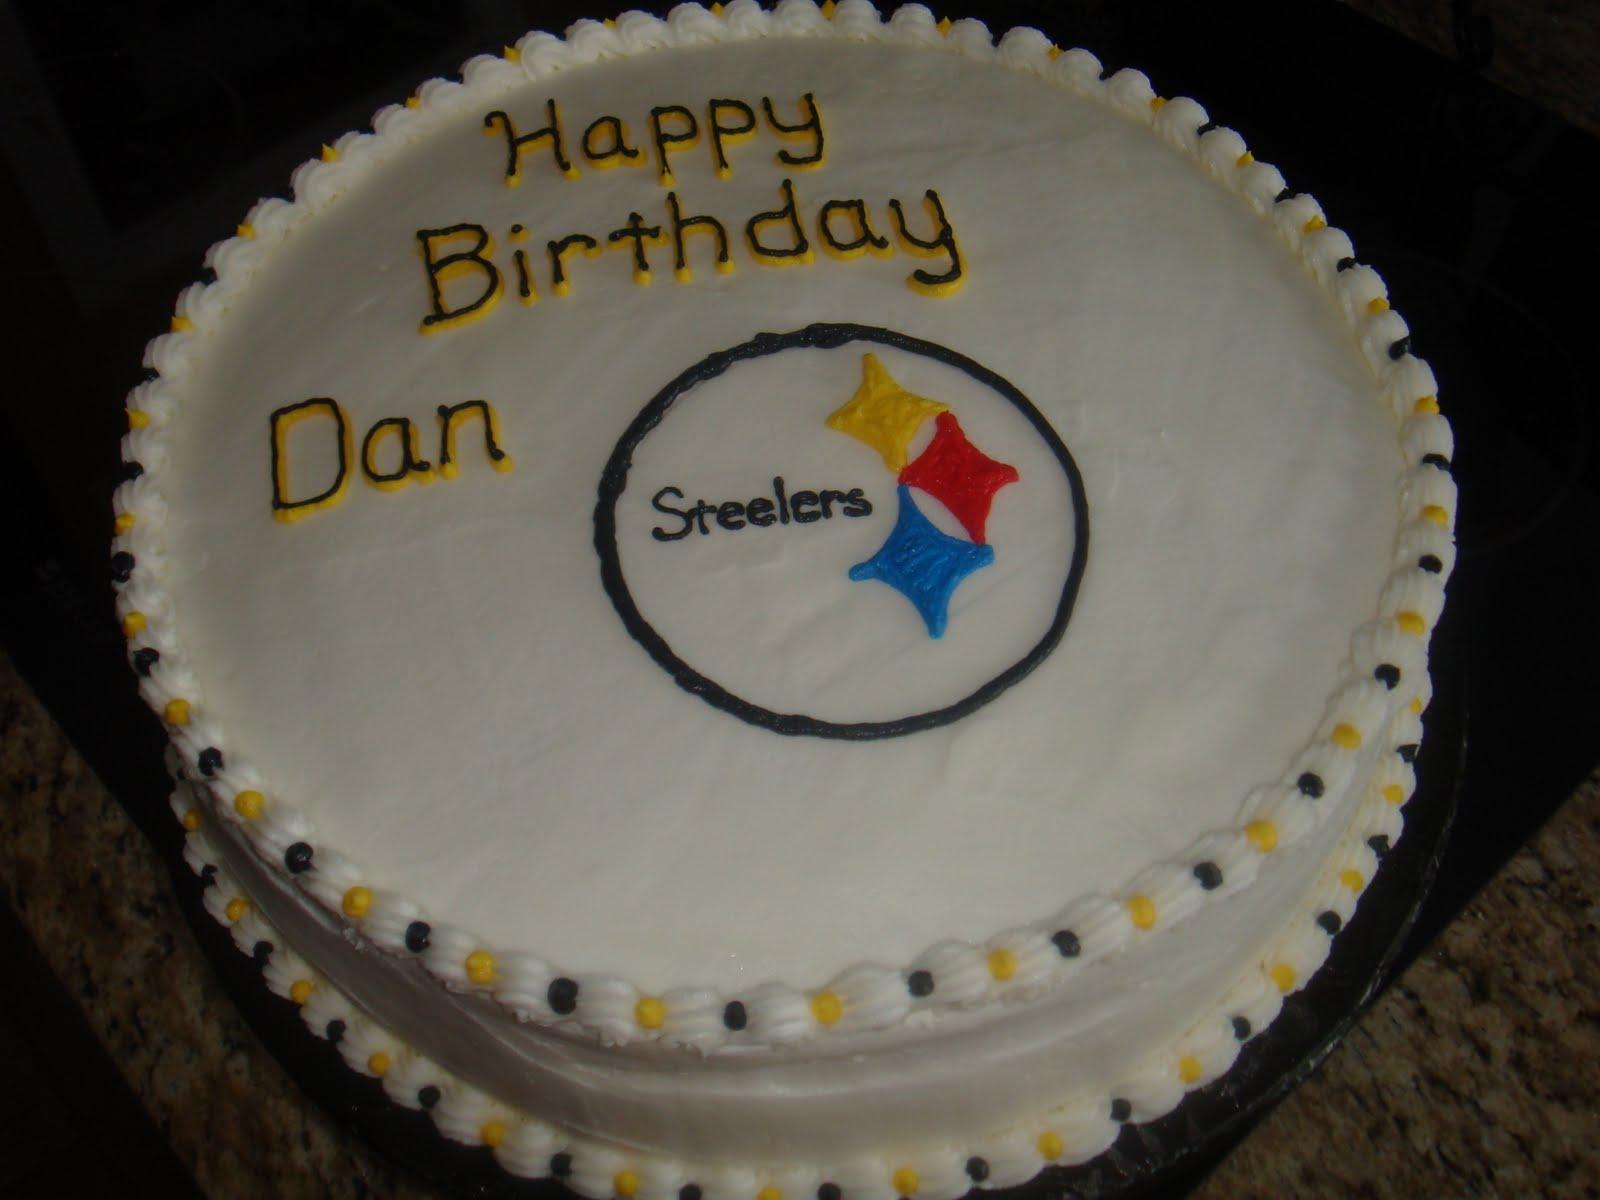 Vicki S Sweet Treats Dan S Pittsburgh Steelers Cake